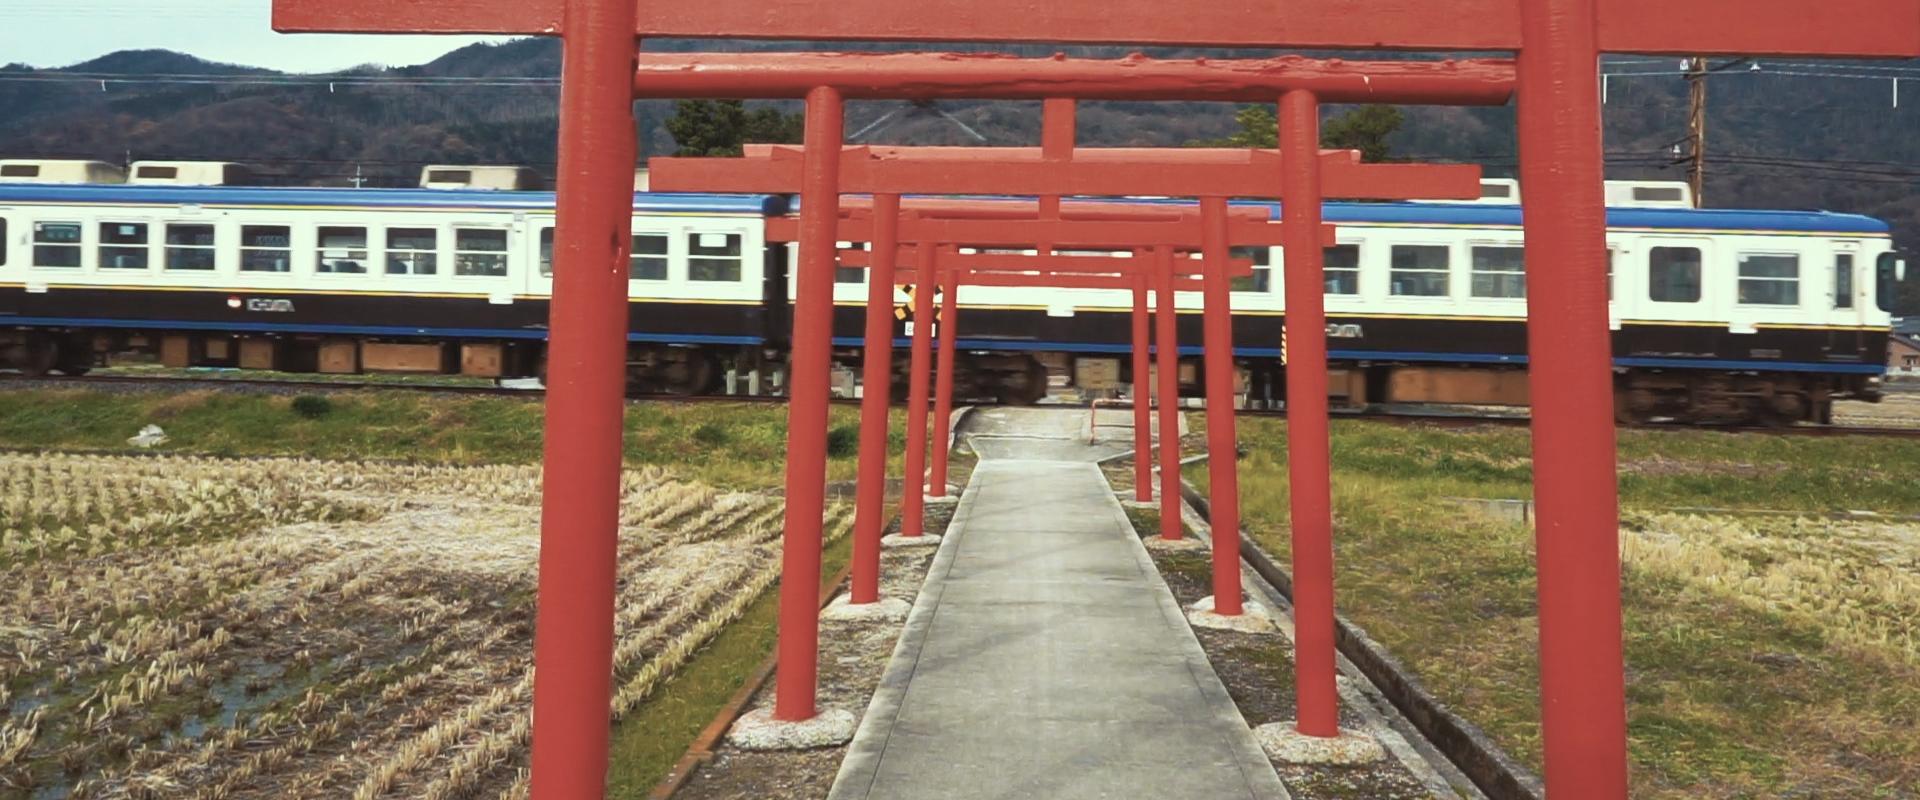 Awazu Inari Shrine, Hiranocho, Izumo, Shimane, Japan.